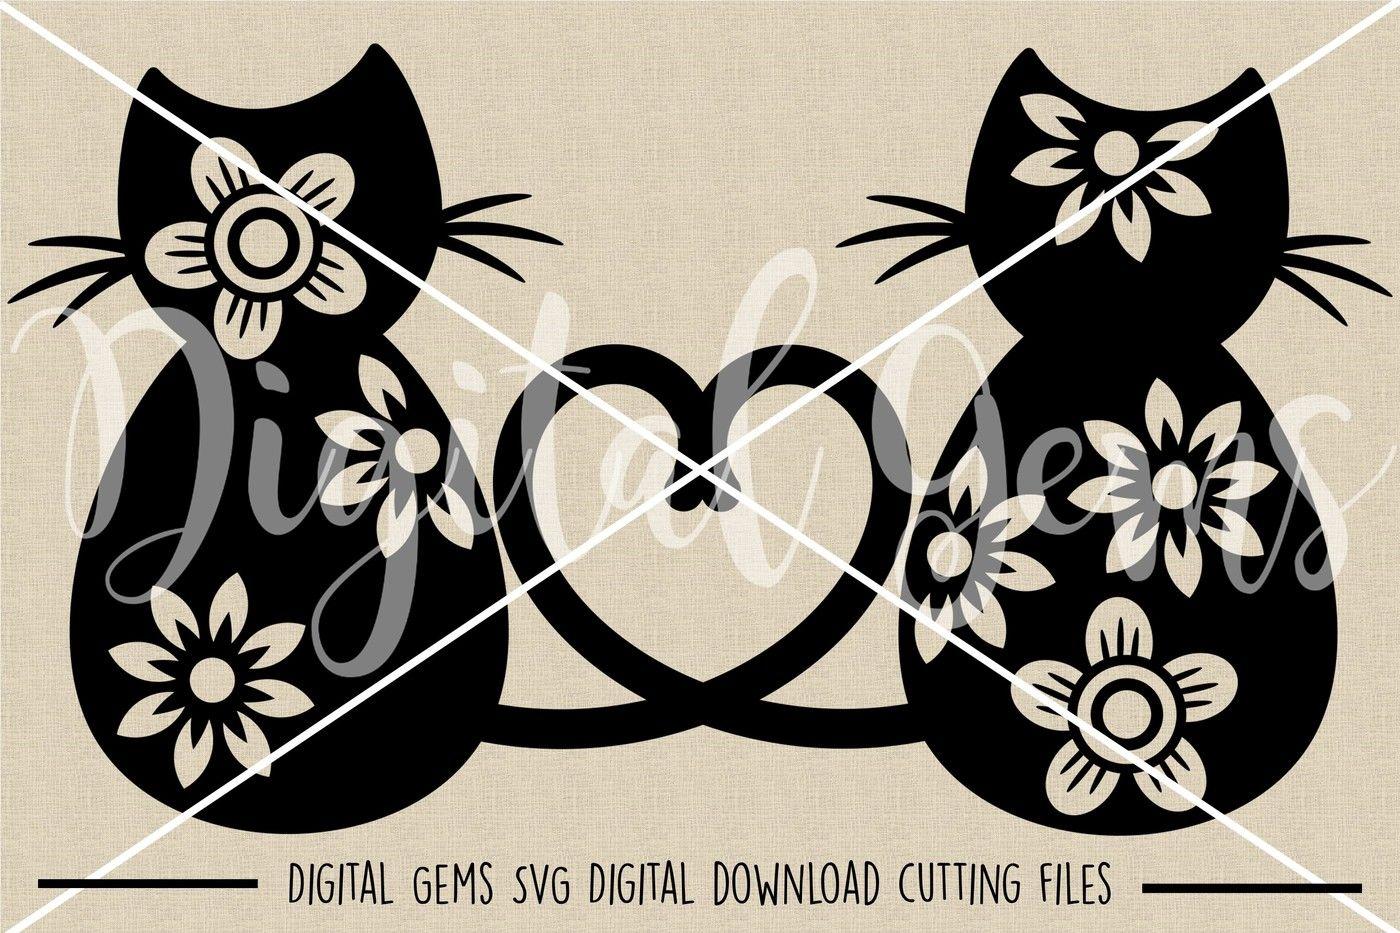 Cat Lover Svg Dxf Eps Png Files By Digital Gems